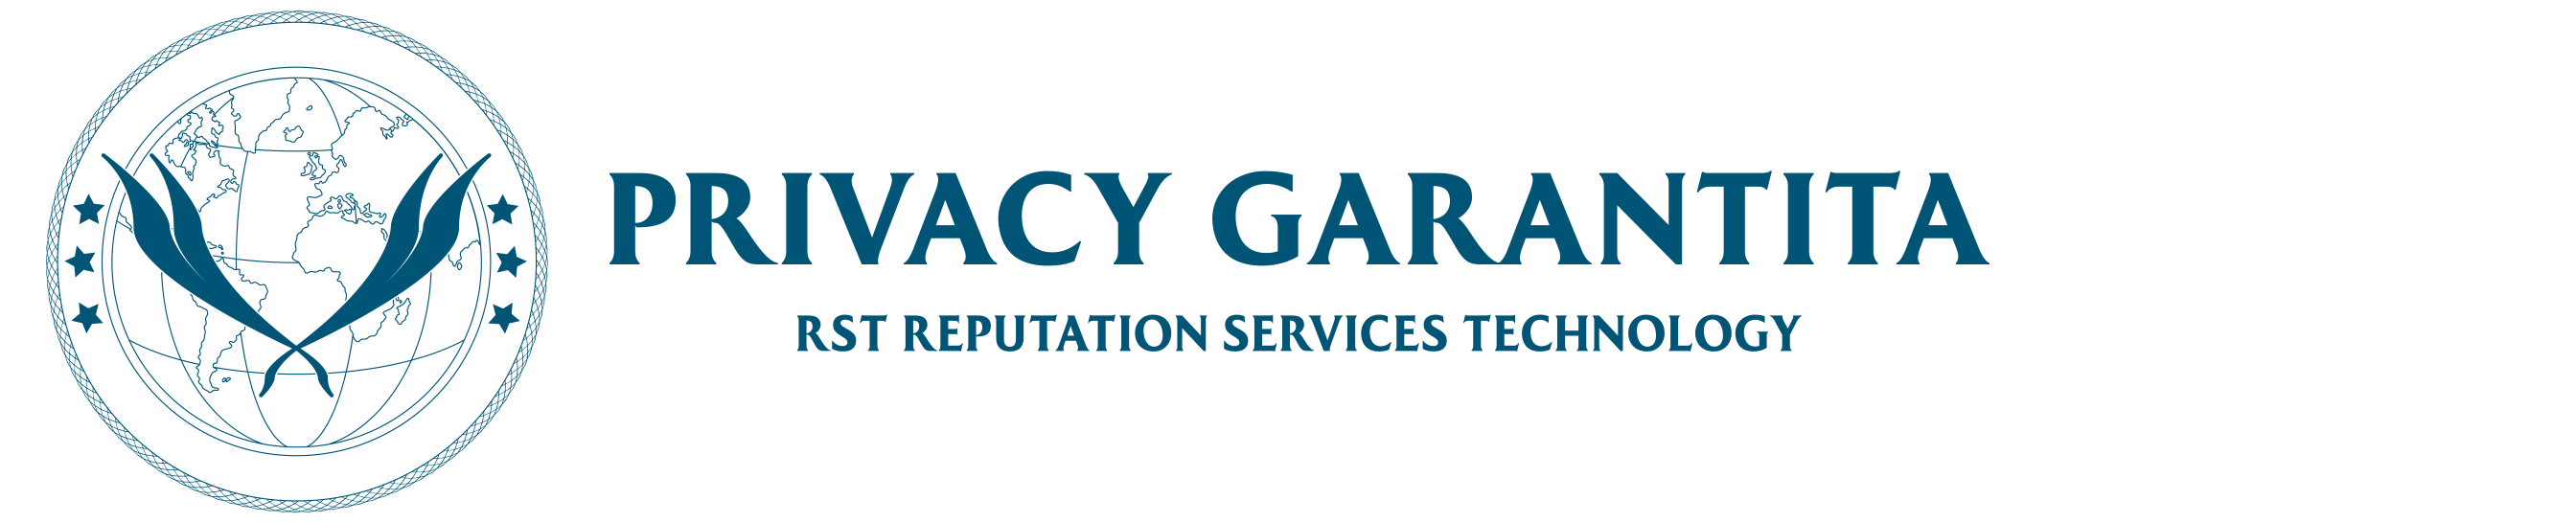 Privacy Garantita